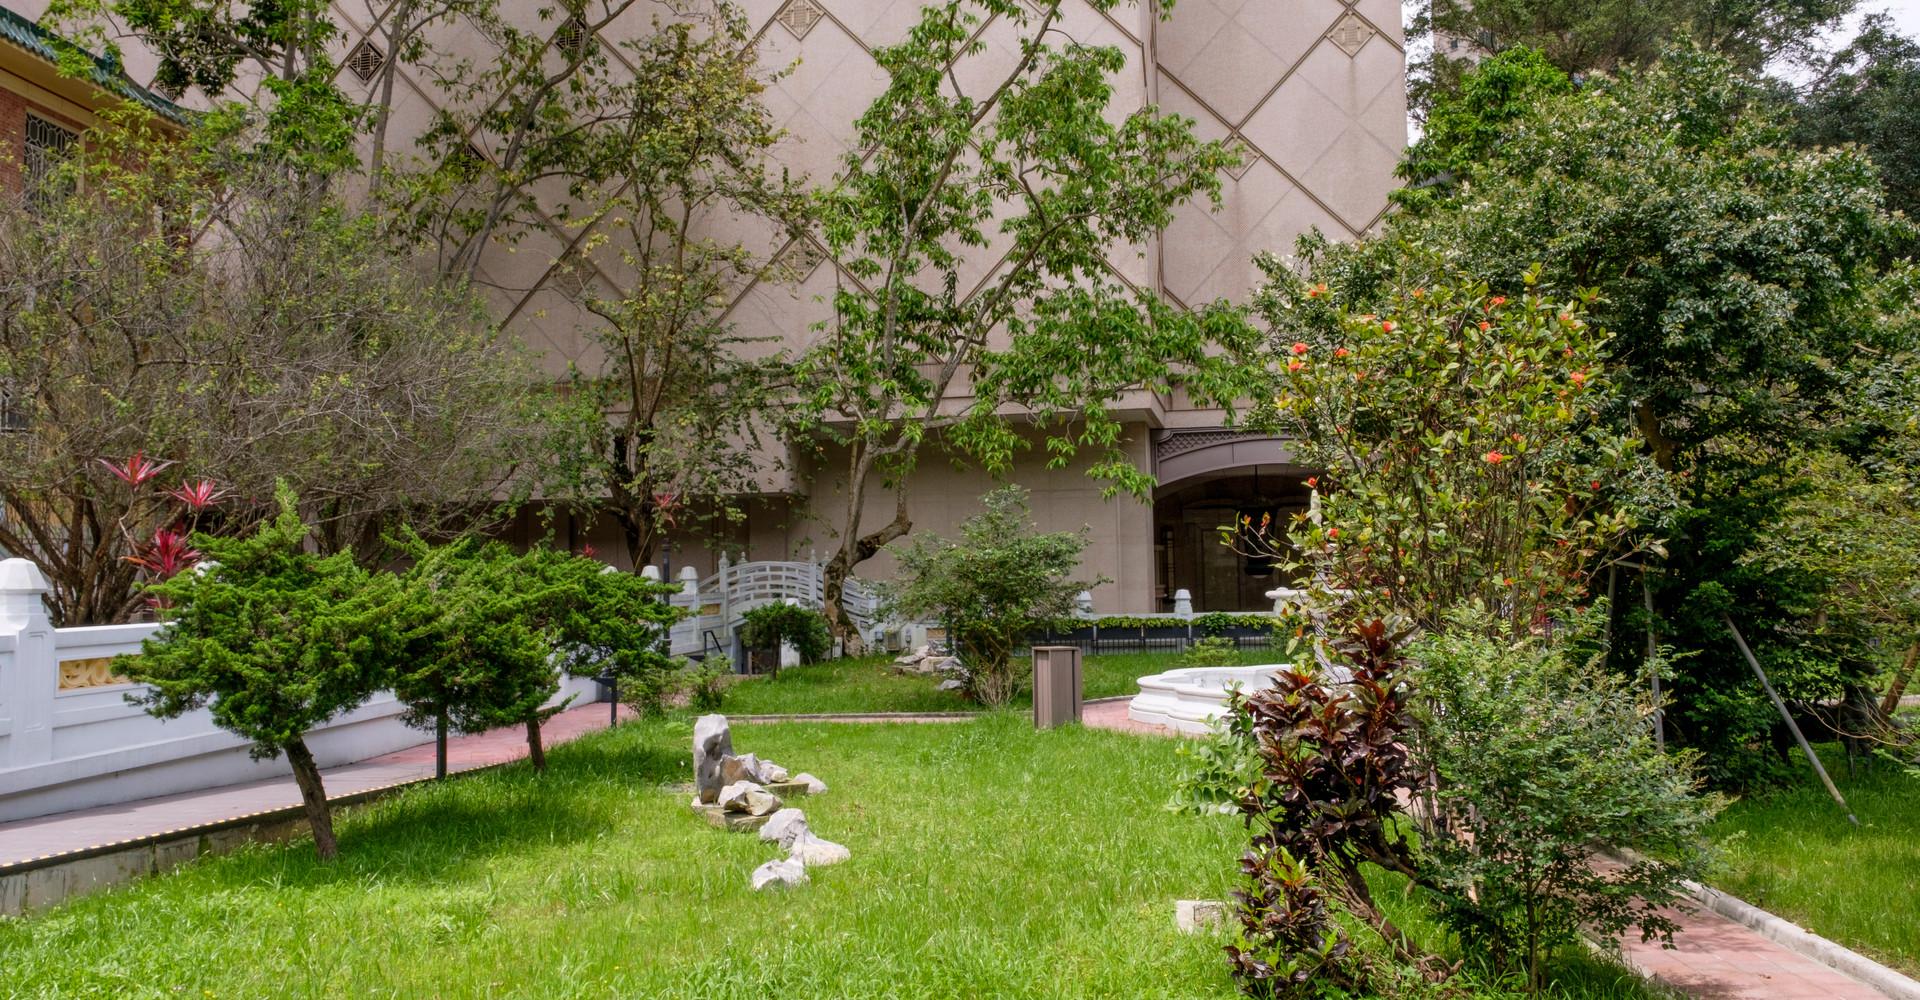 Free admission to Garden Area